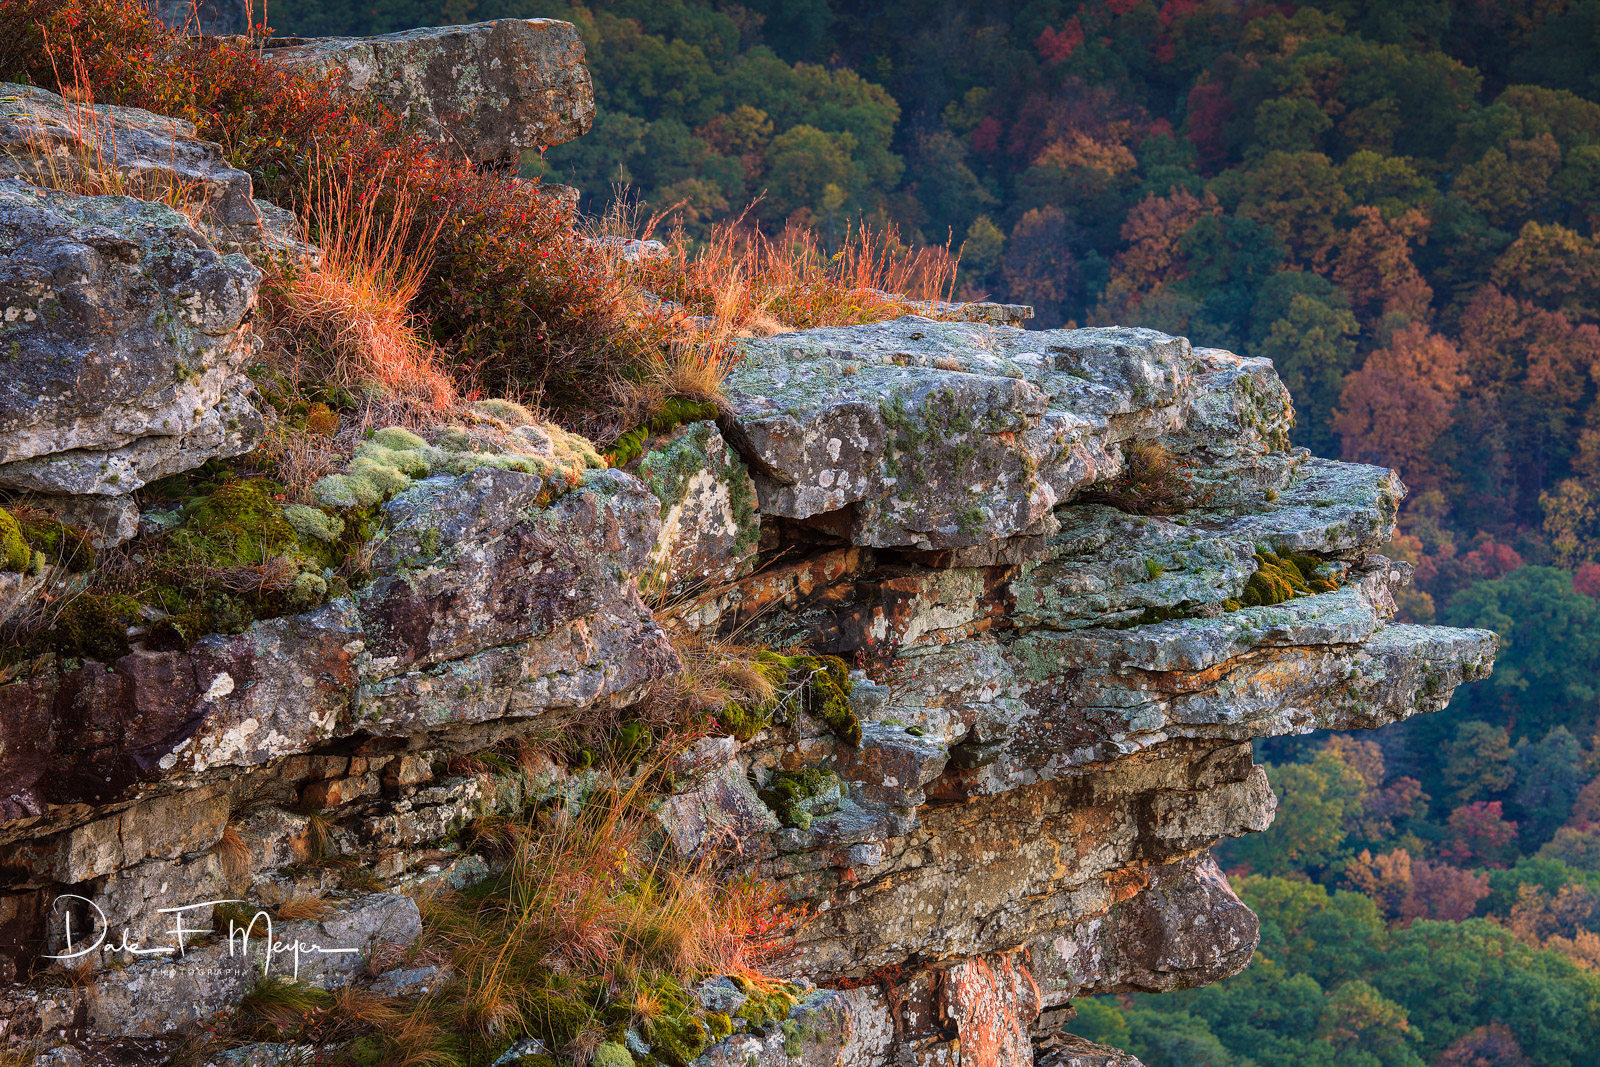 Arkansas,Mountain Rock Outcrop,Mountains and Overlooks Gallerie,bluff overlook,mt magazine,sunset, moss, grasses, photo